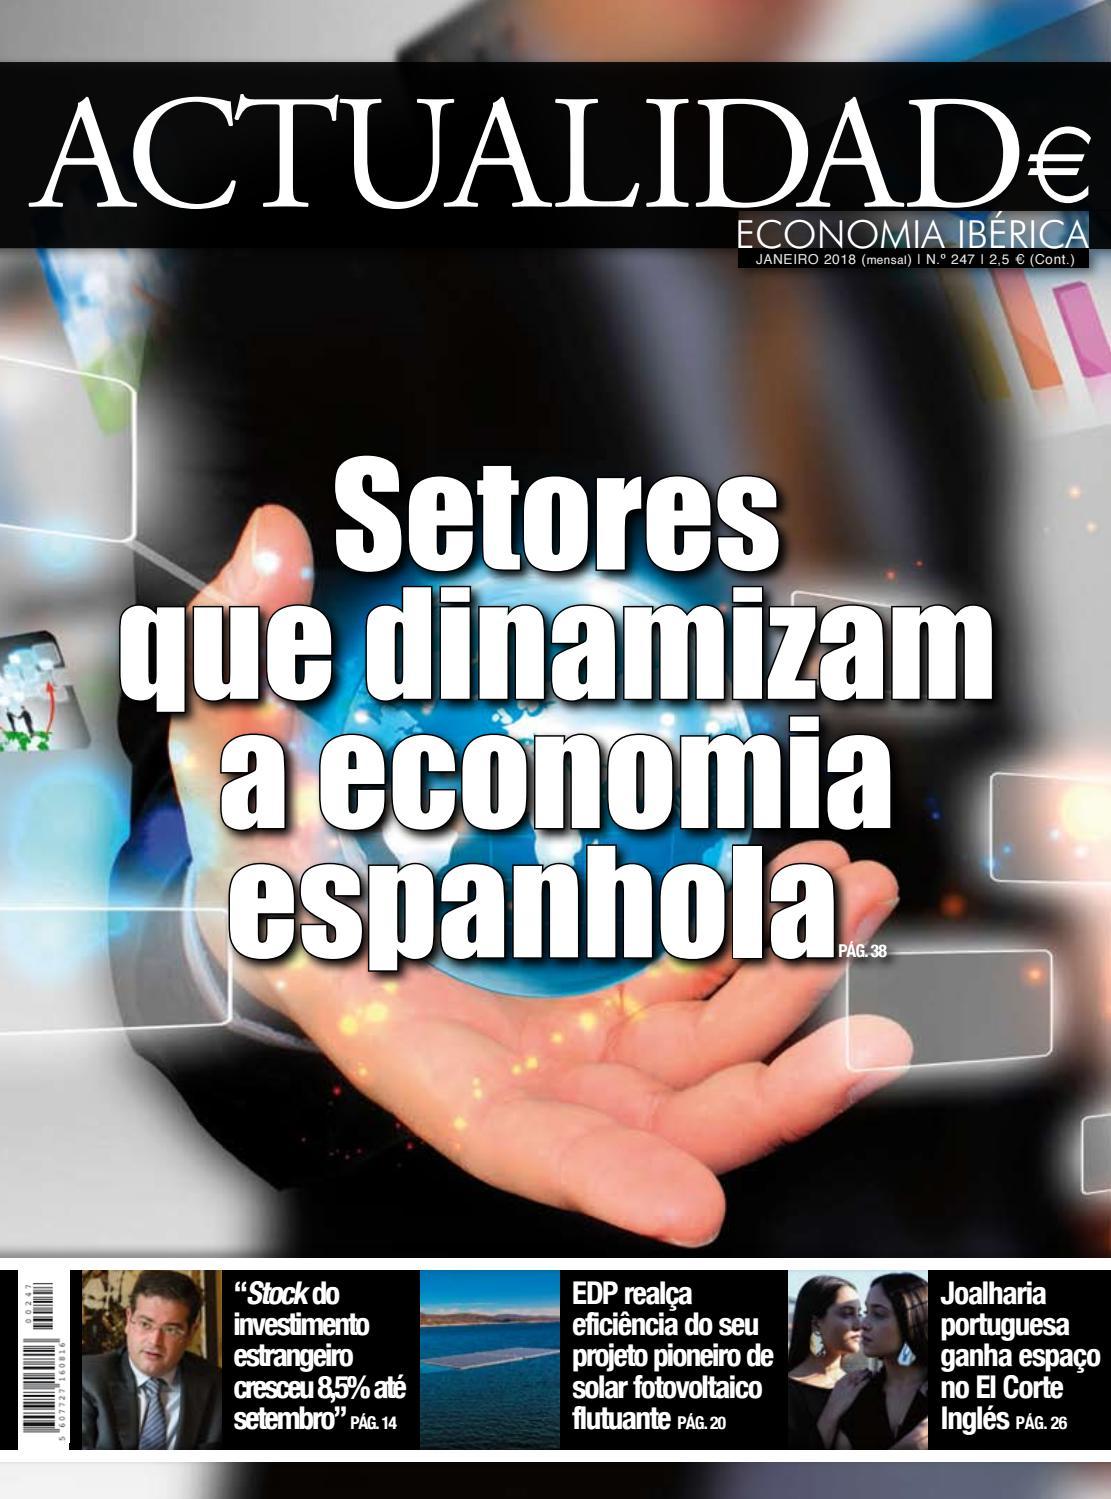 7e56811b5d4 Actualidade Economia Ibérica - nº 247 by Actualidade Economia Ibérica -  issuu